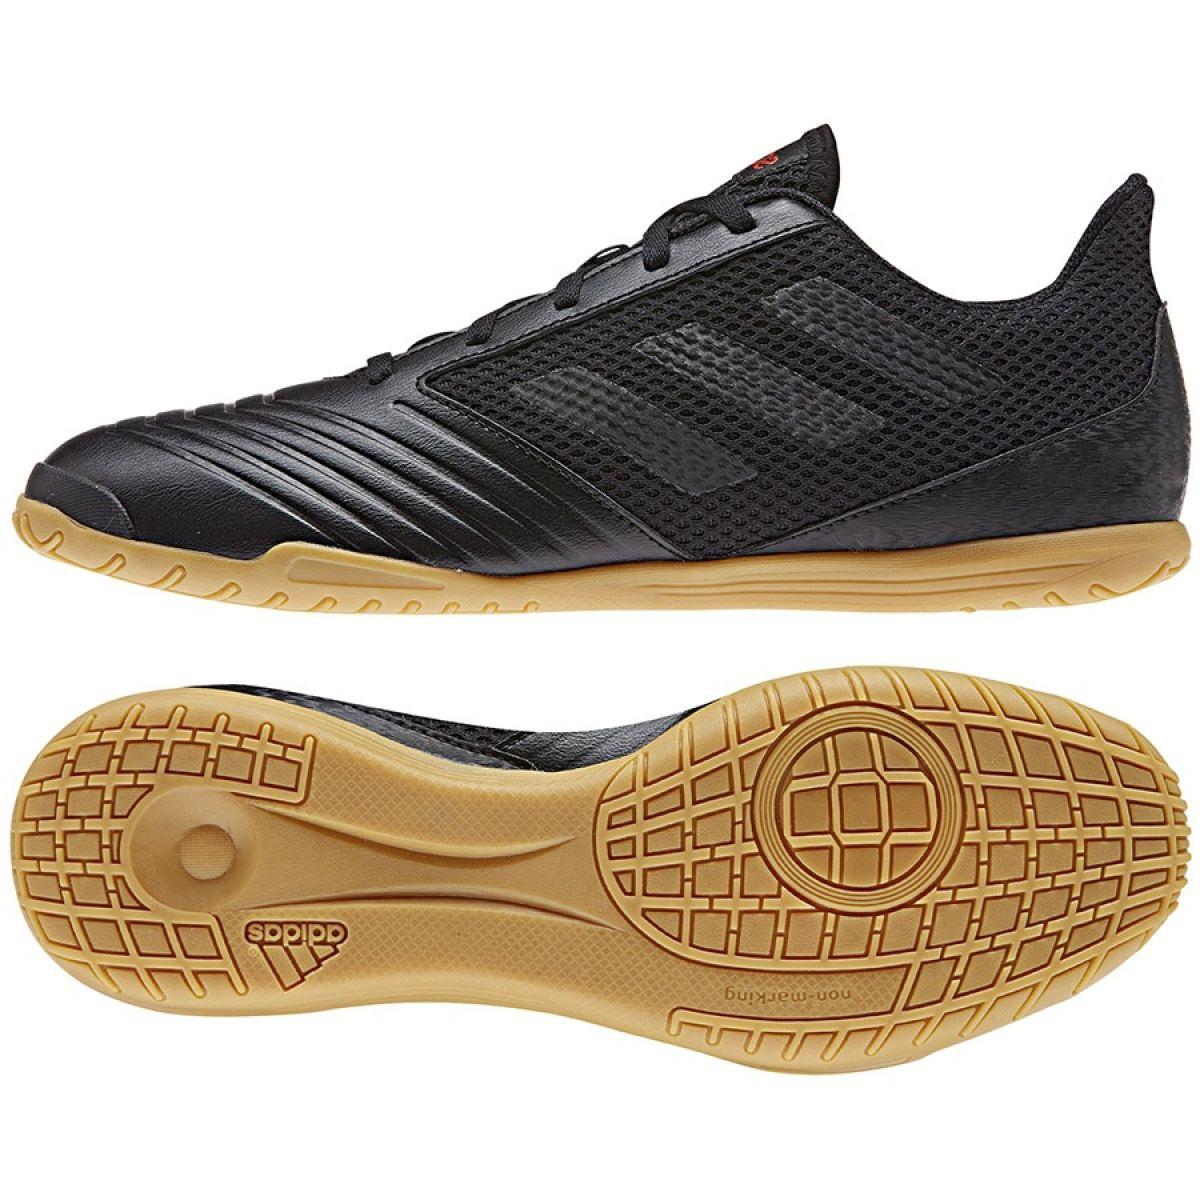 0011ce8f9 Indoor shoes adidas Predator 19.4 In Sala M D97975 - ButyModne.pl